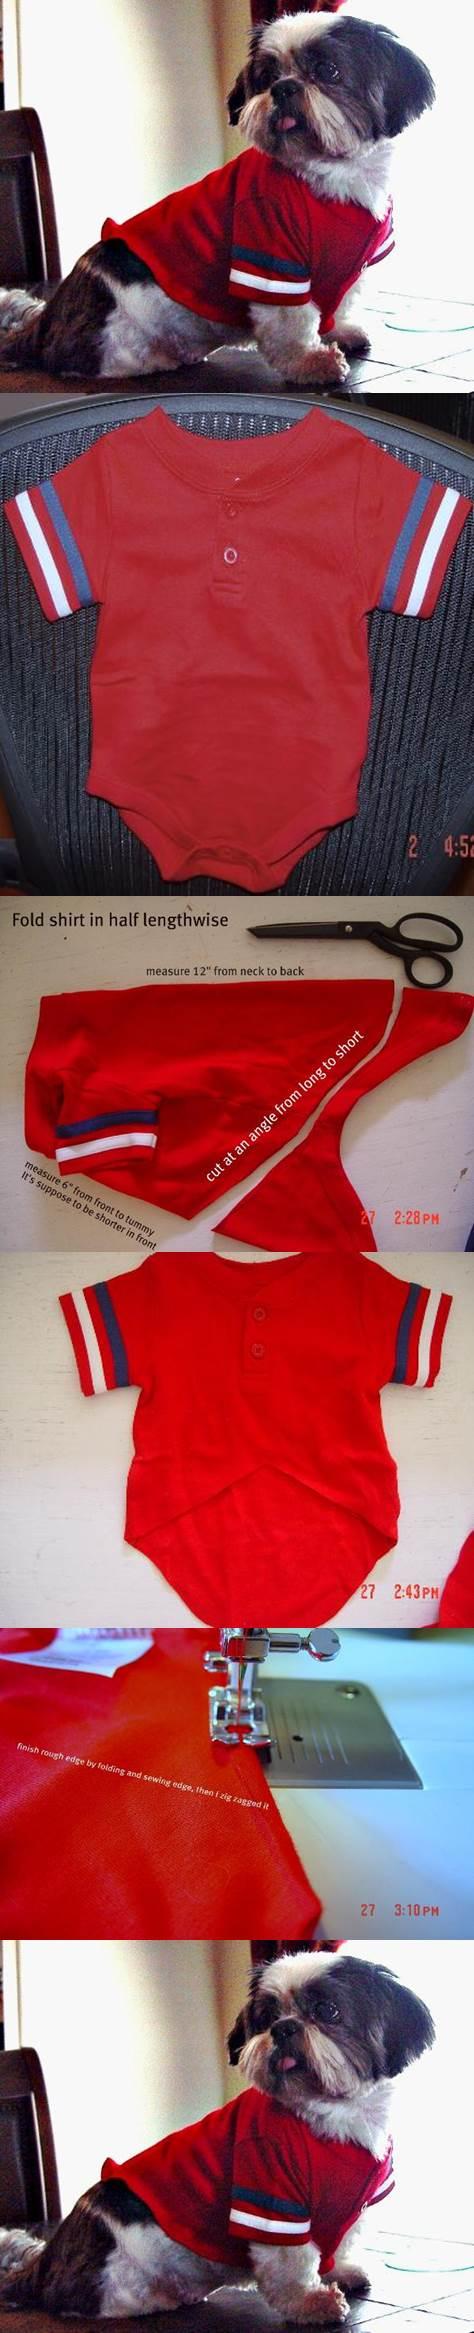 DIY Dog Shirt from Baby Tee 2